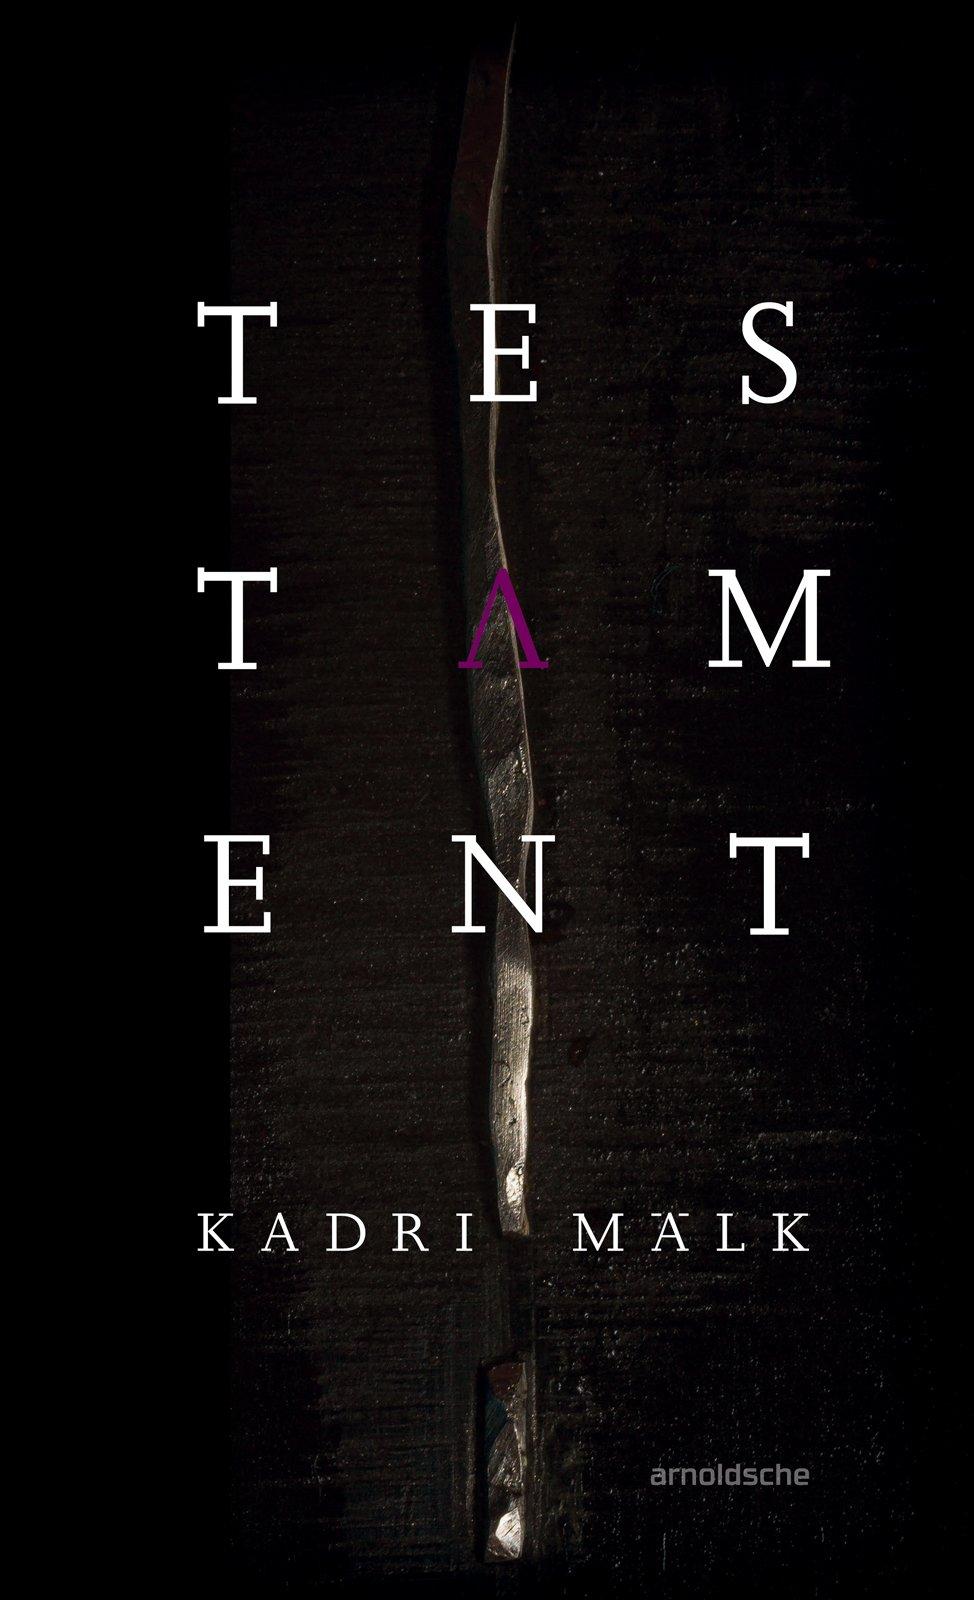 Kadri Mälk: Testament